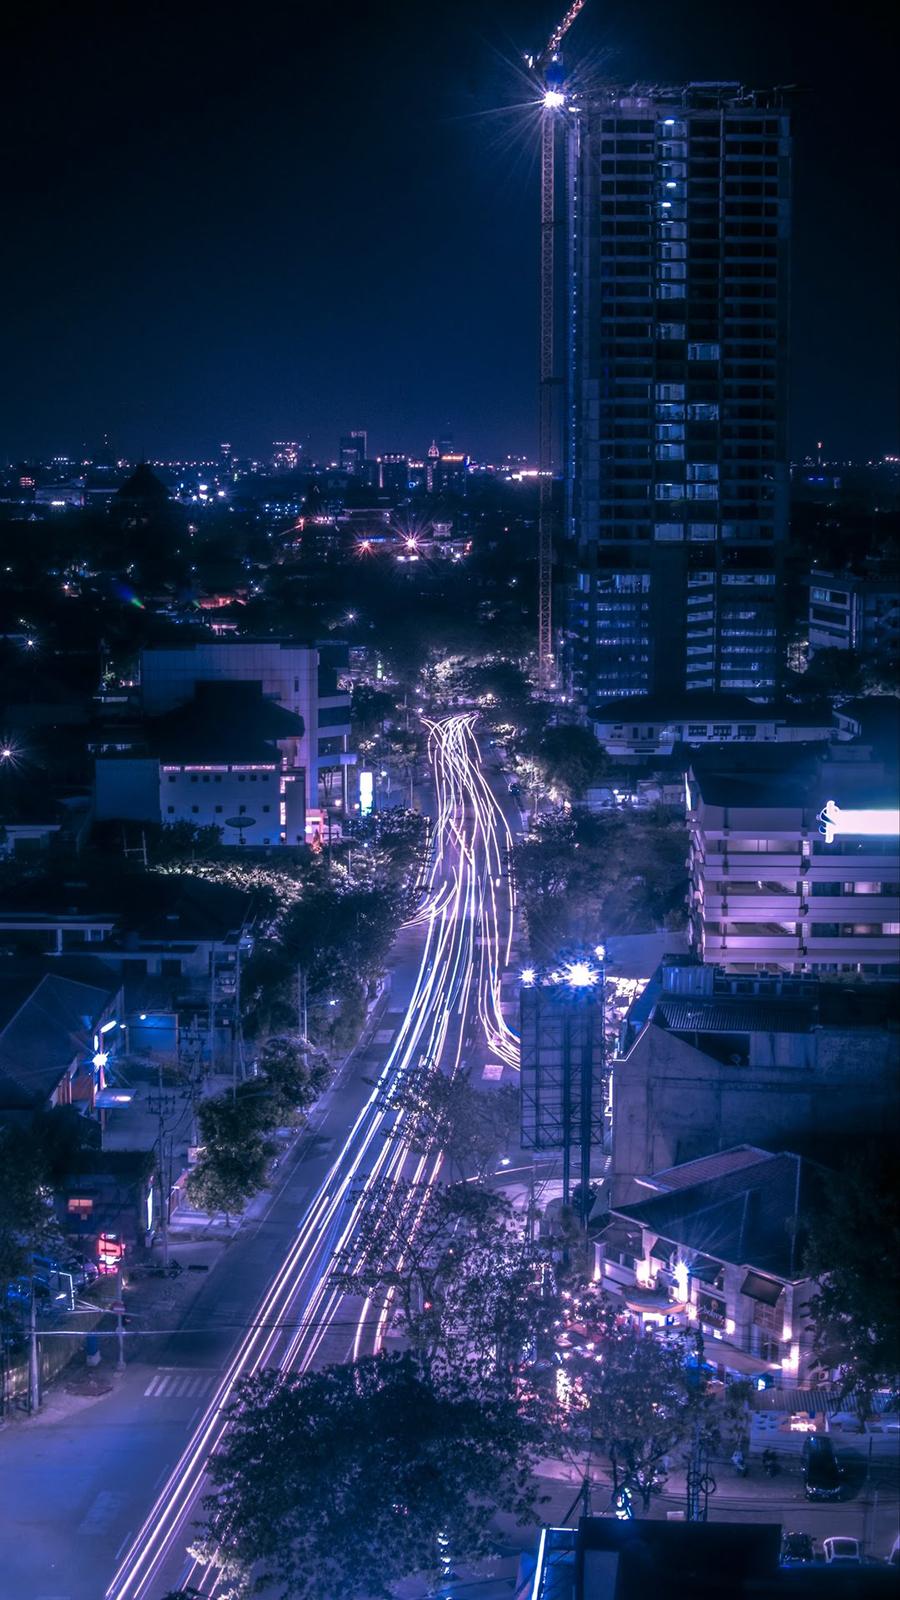 City Blue Effect Wallpaper – Best Wallpapers Free Download